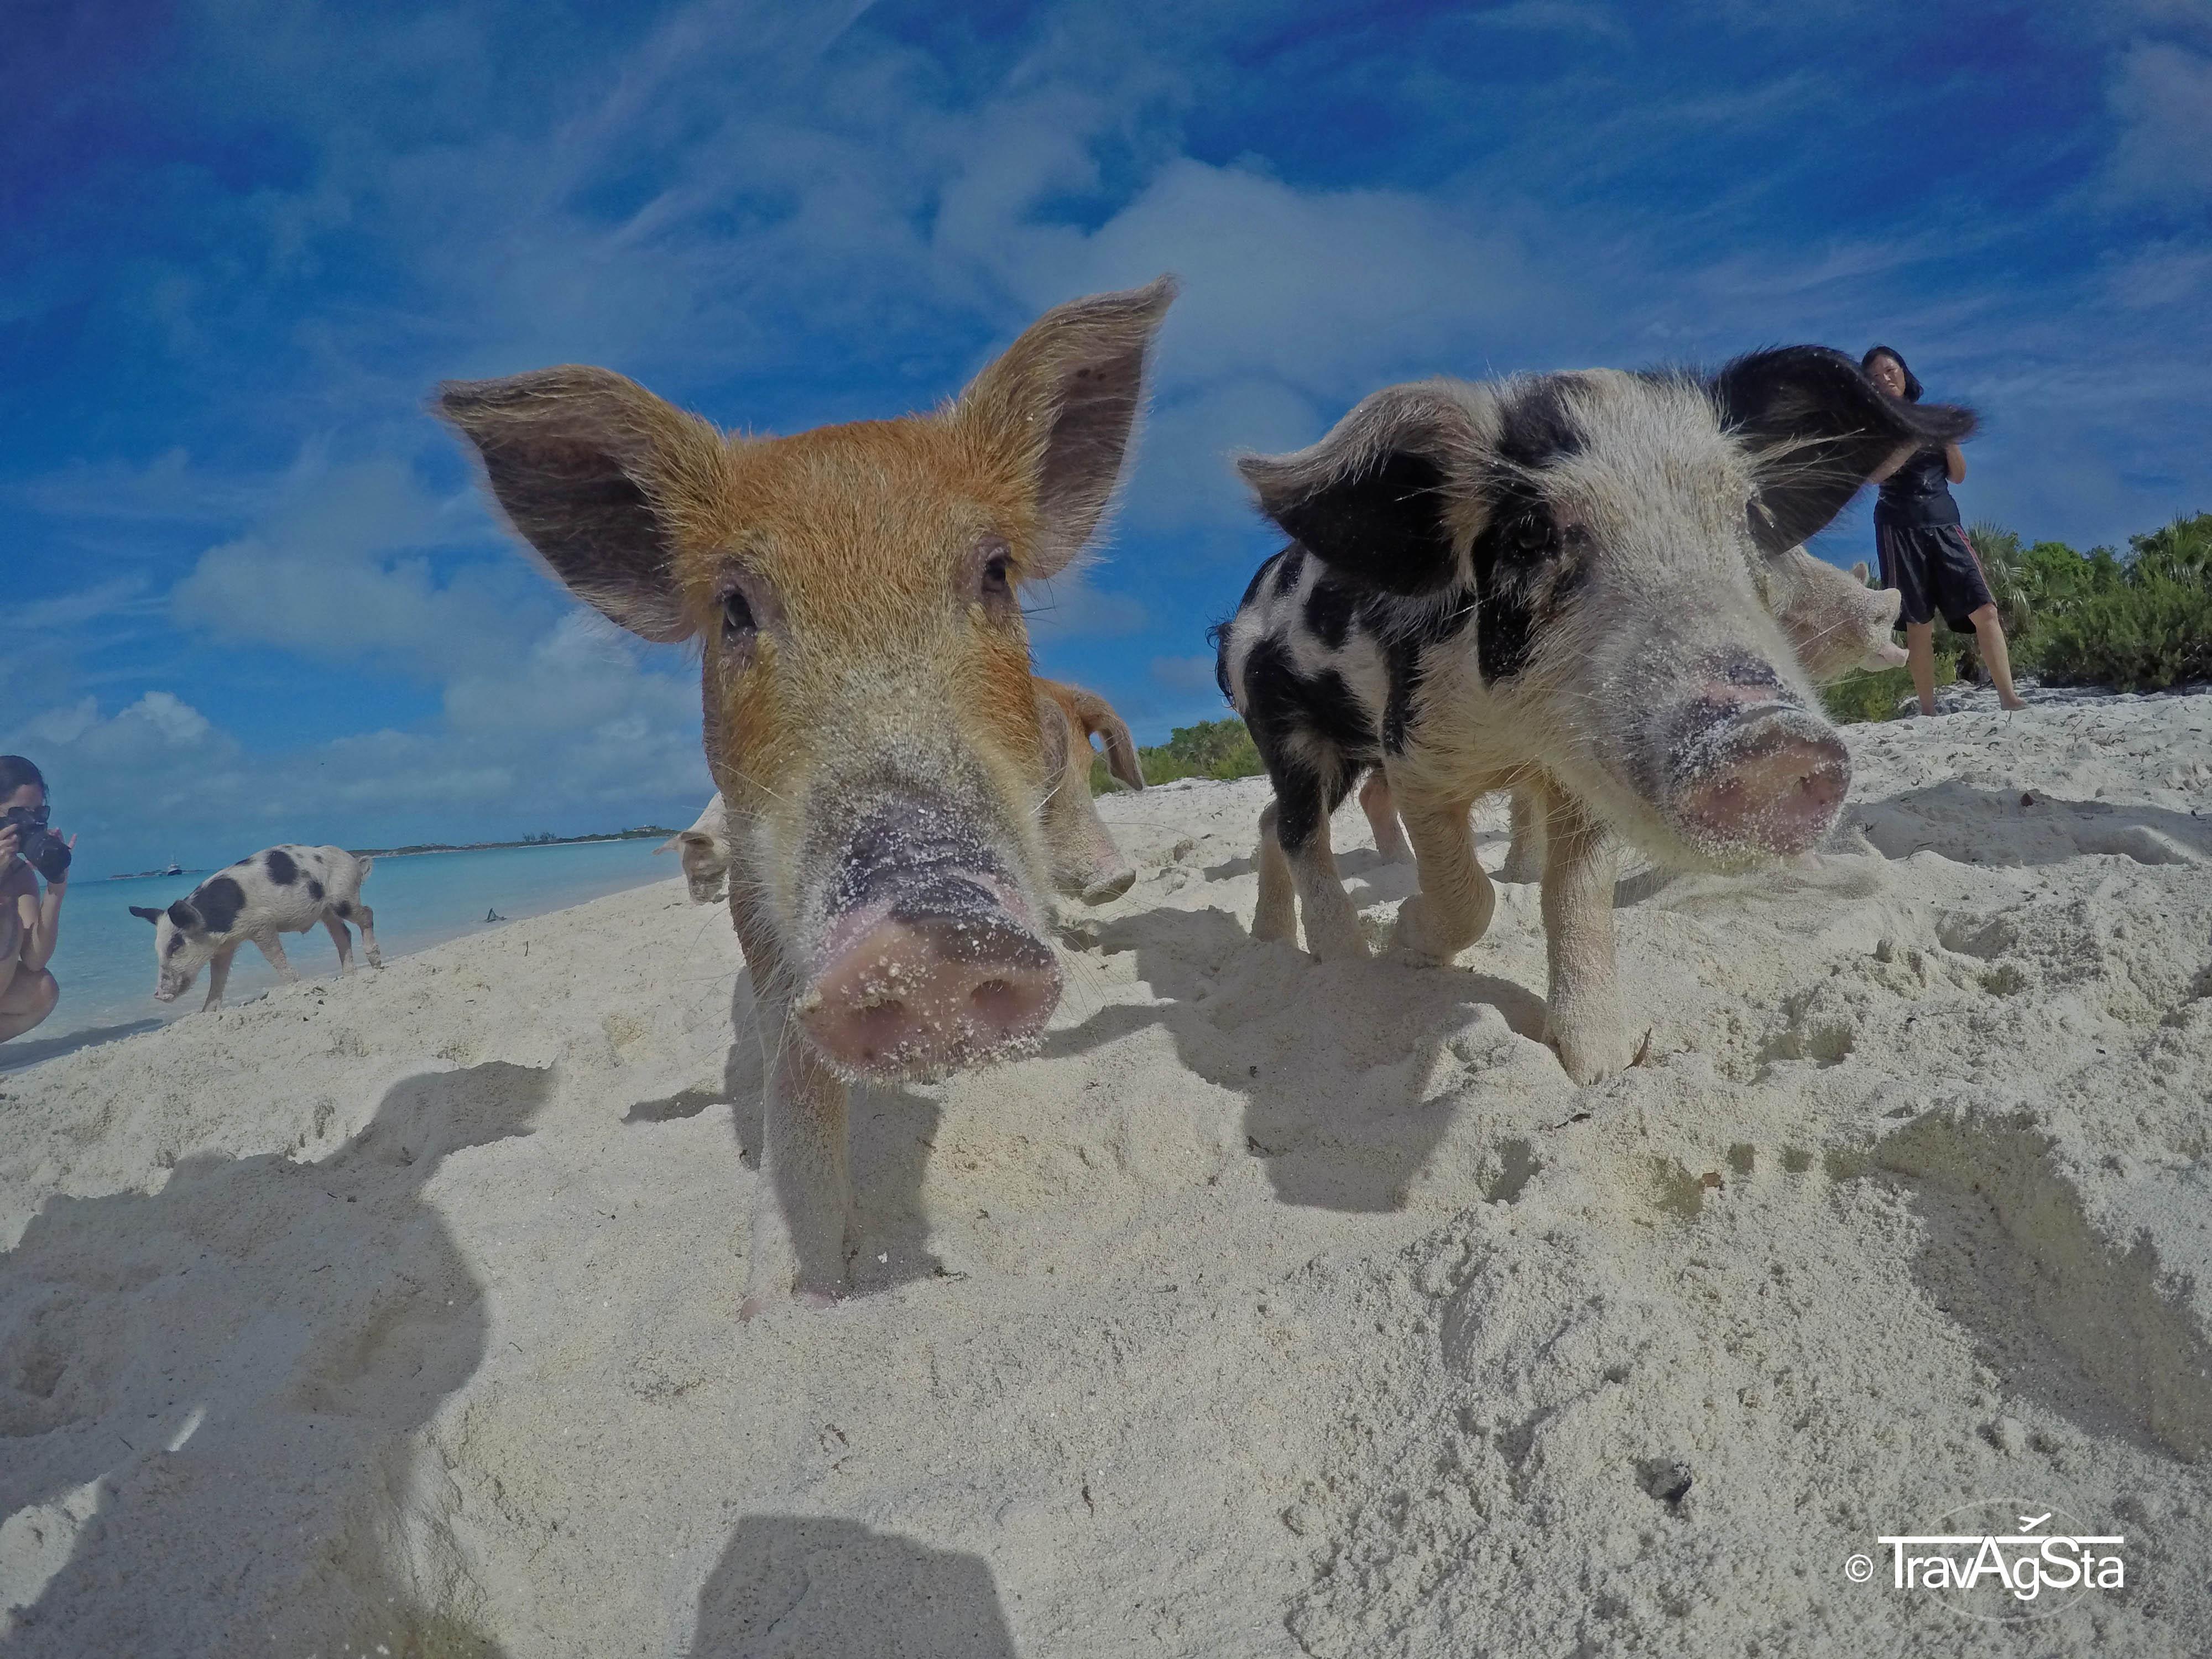 Swimming Pigs, Nurse Sharks, Iguanas – a day trip along the Exuma Cays!